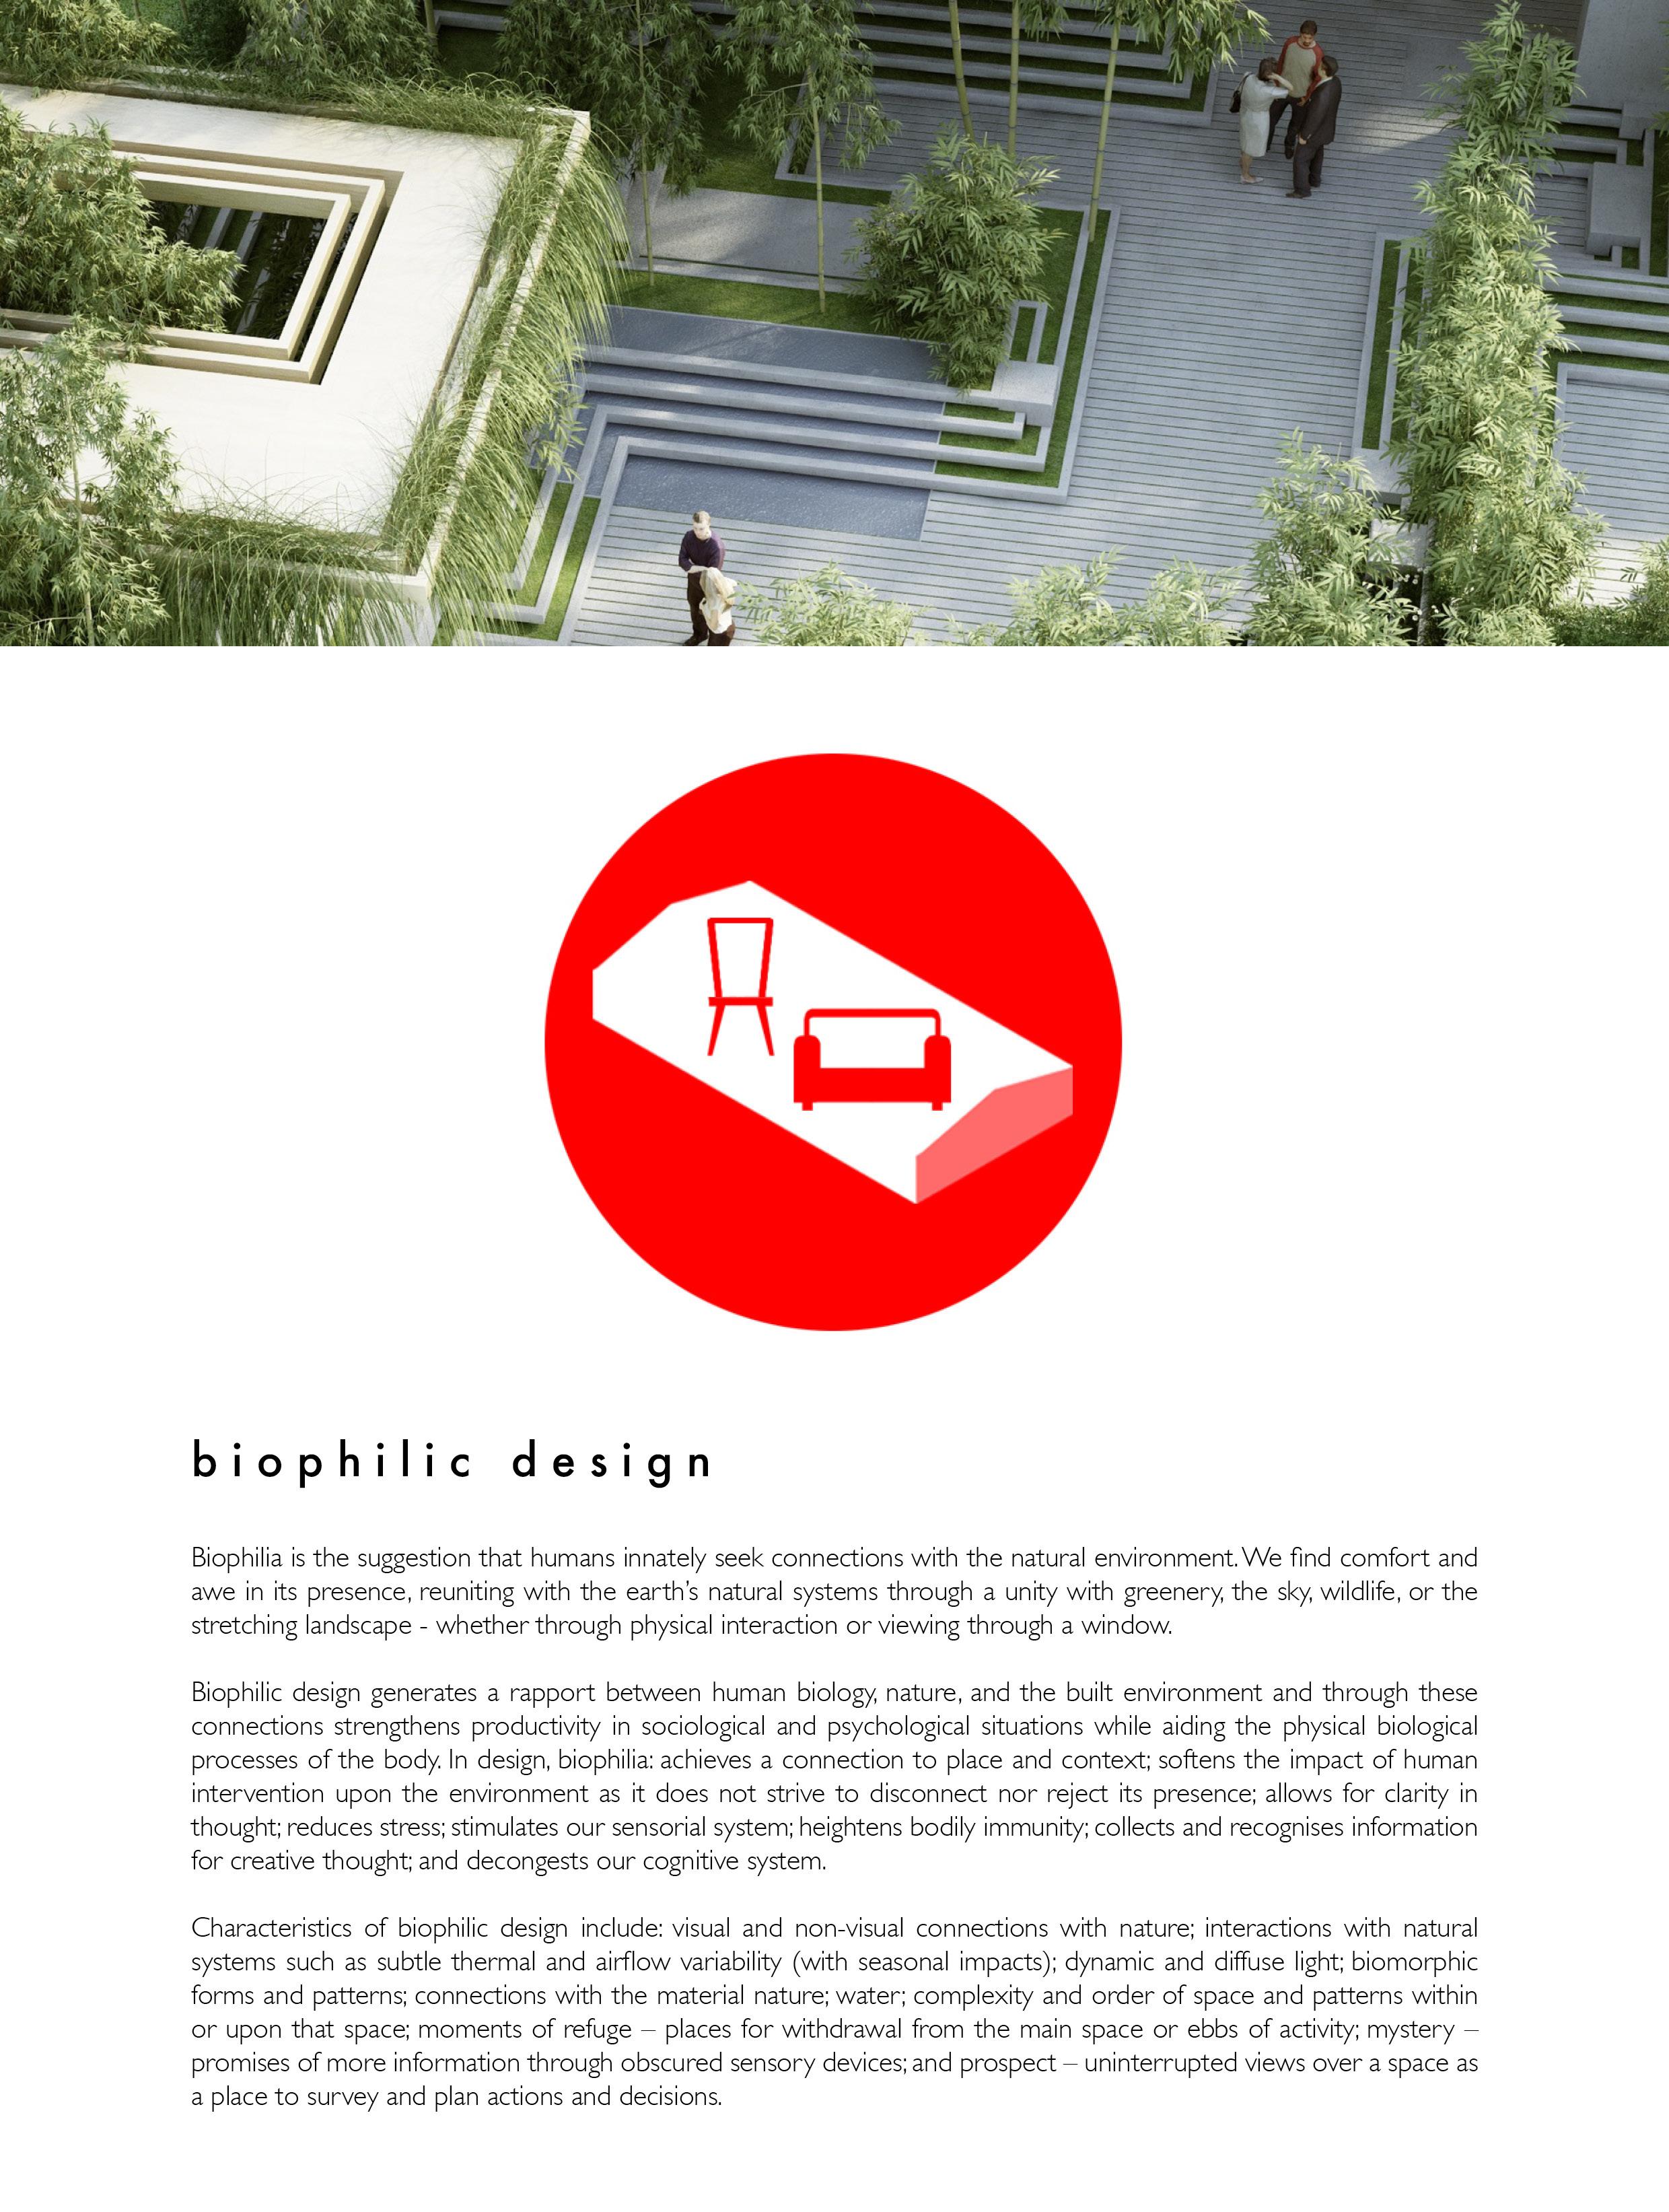 Atelier Aitken Workplace design 4 biophillic design.jpg